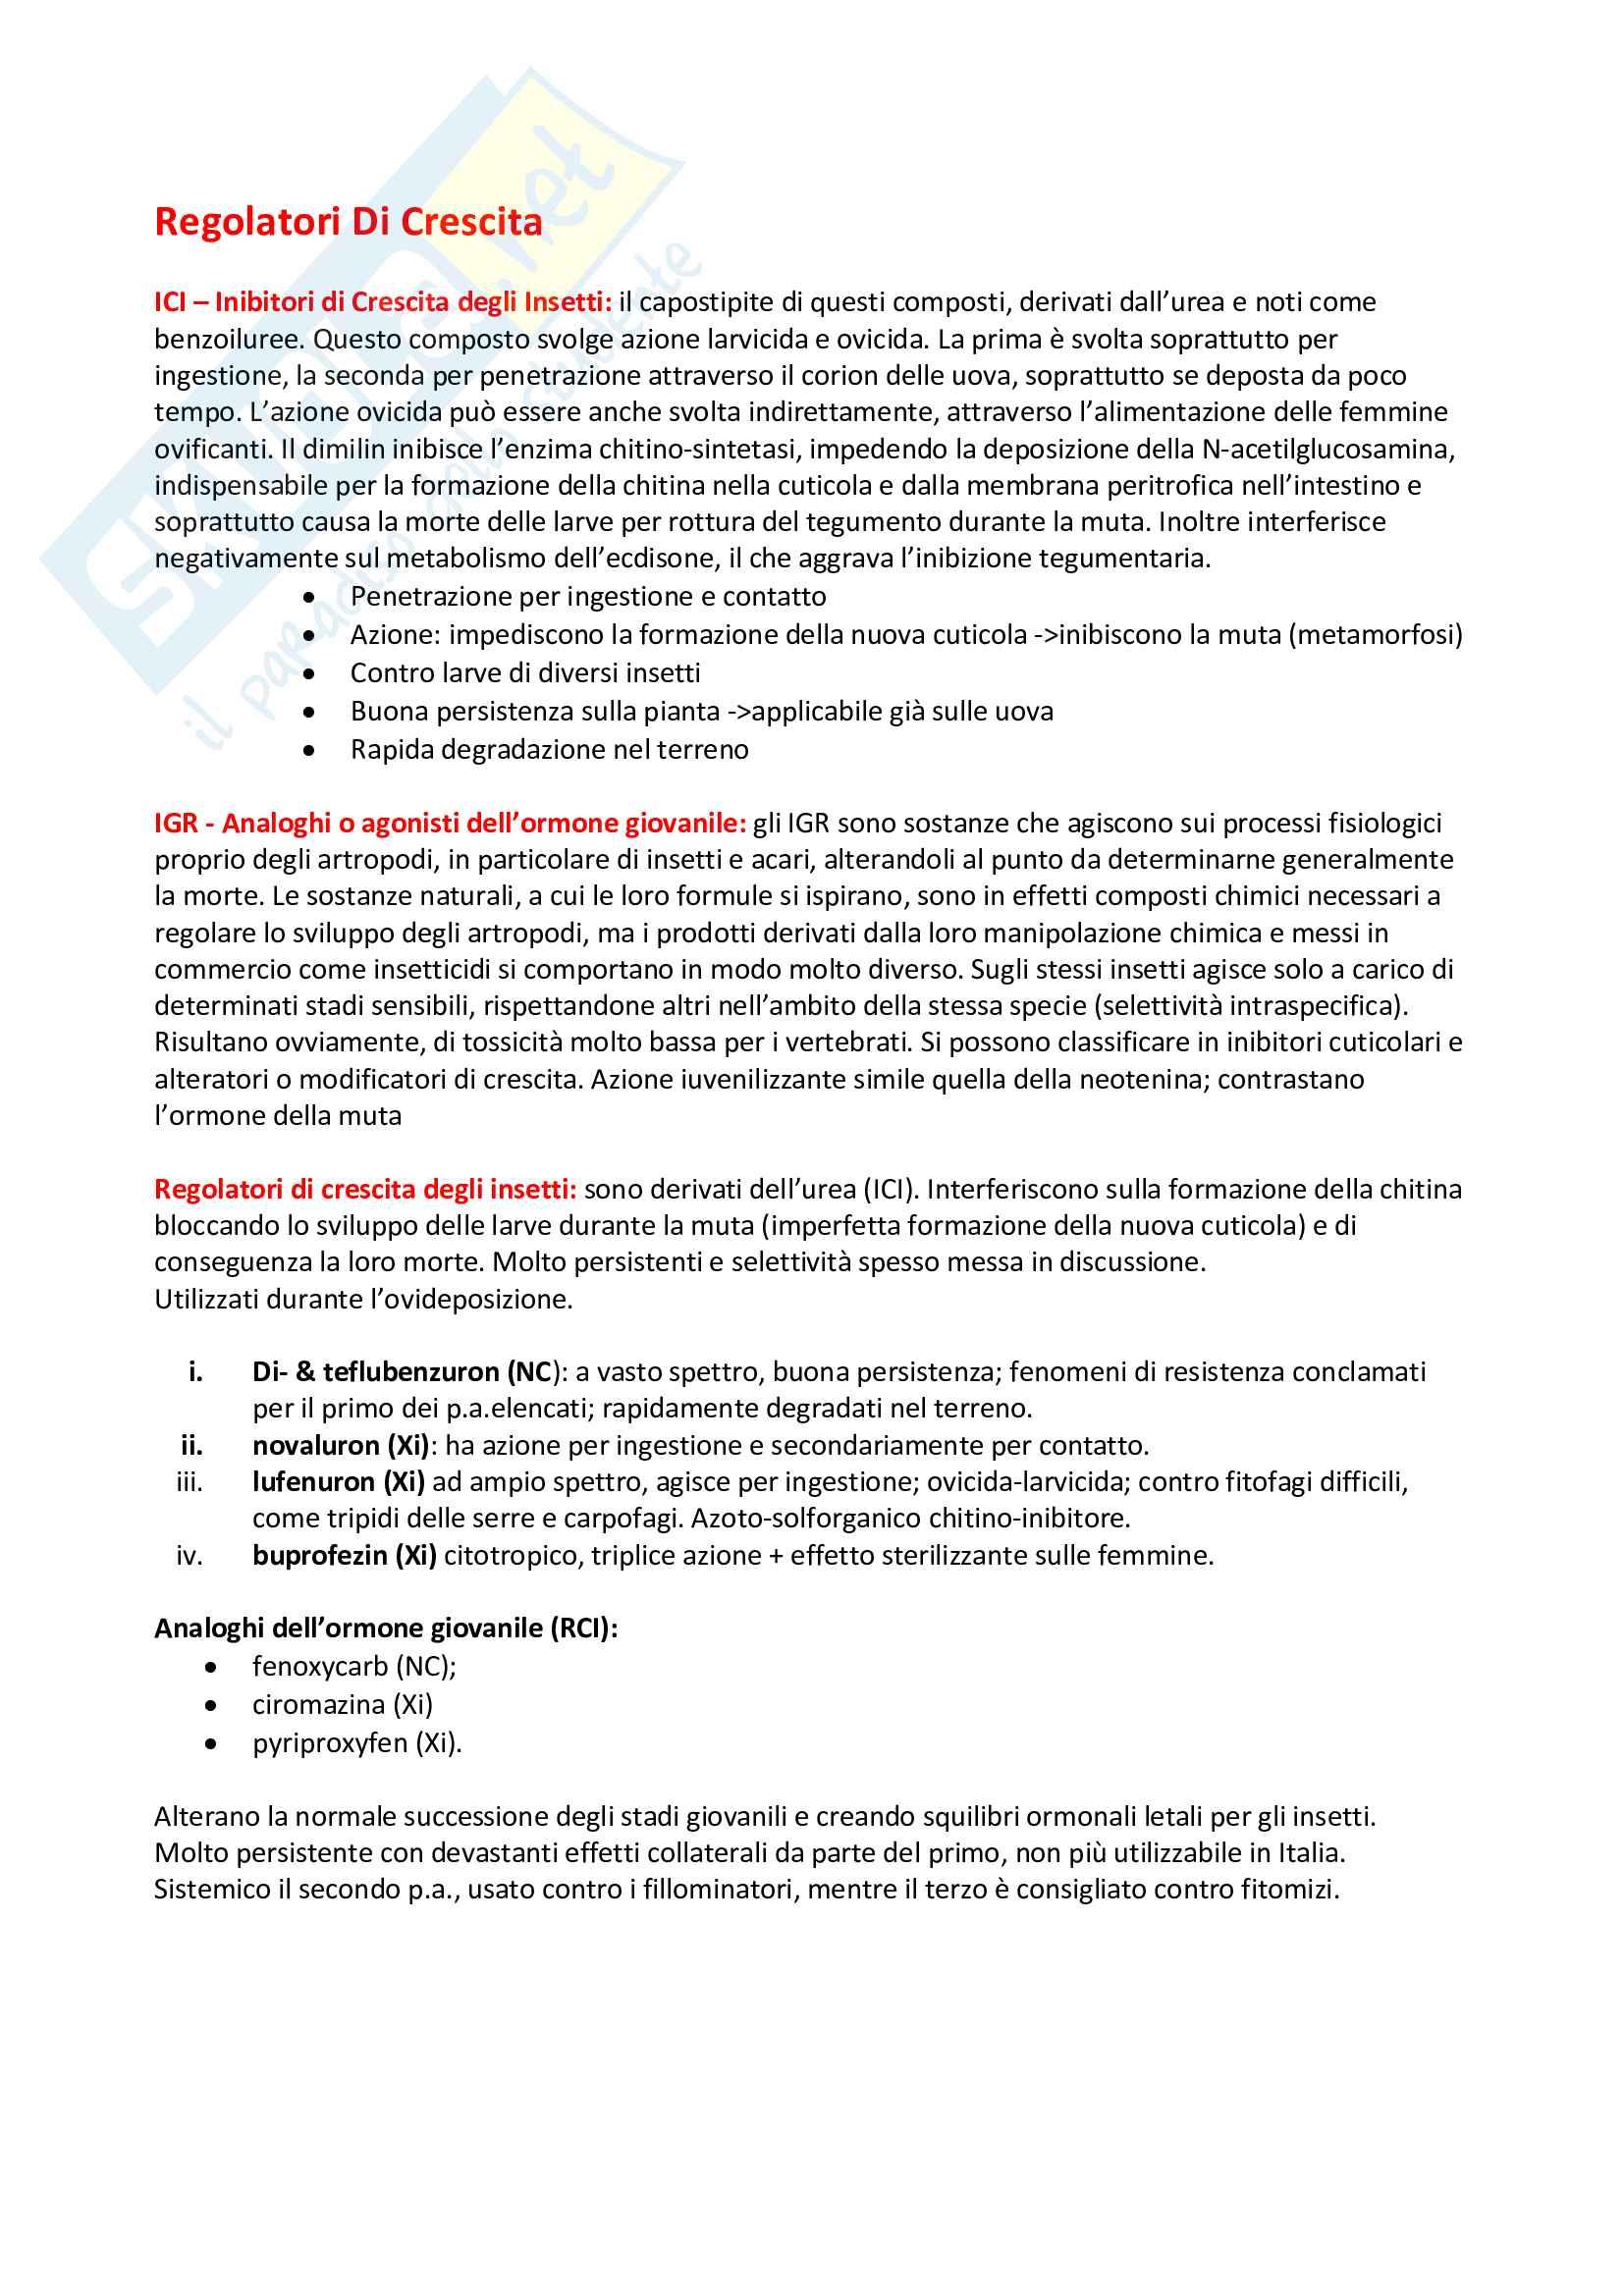 Entomologia - Insetticidi Pag. 6